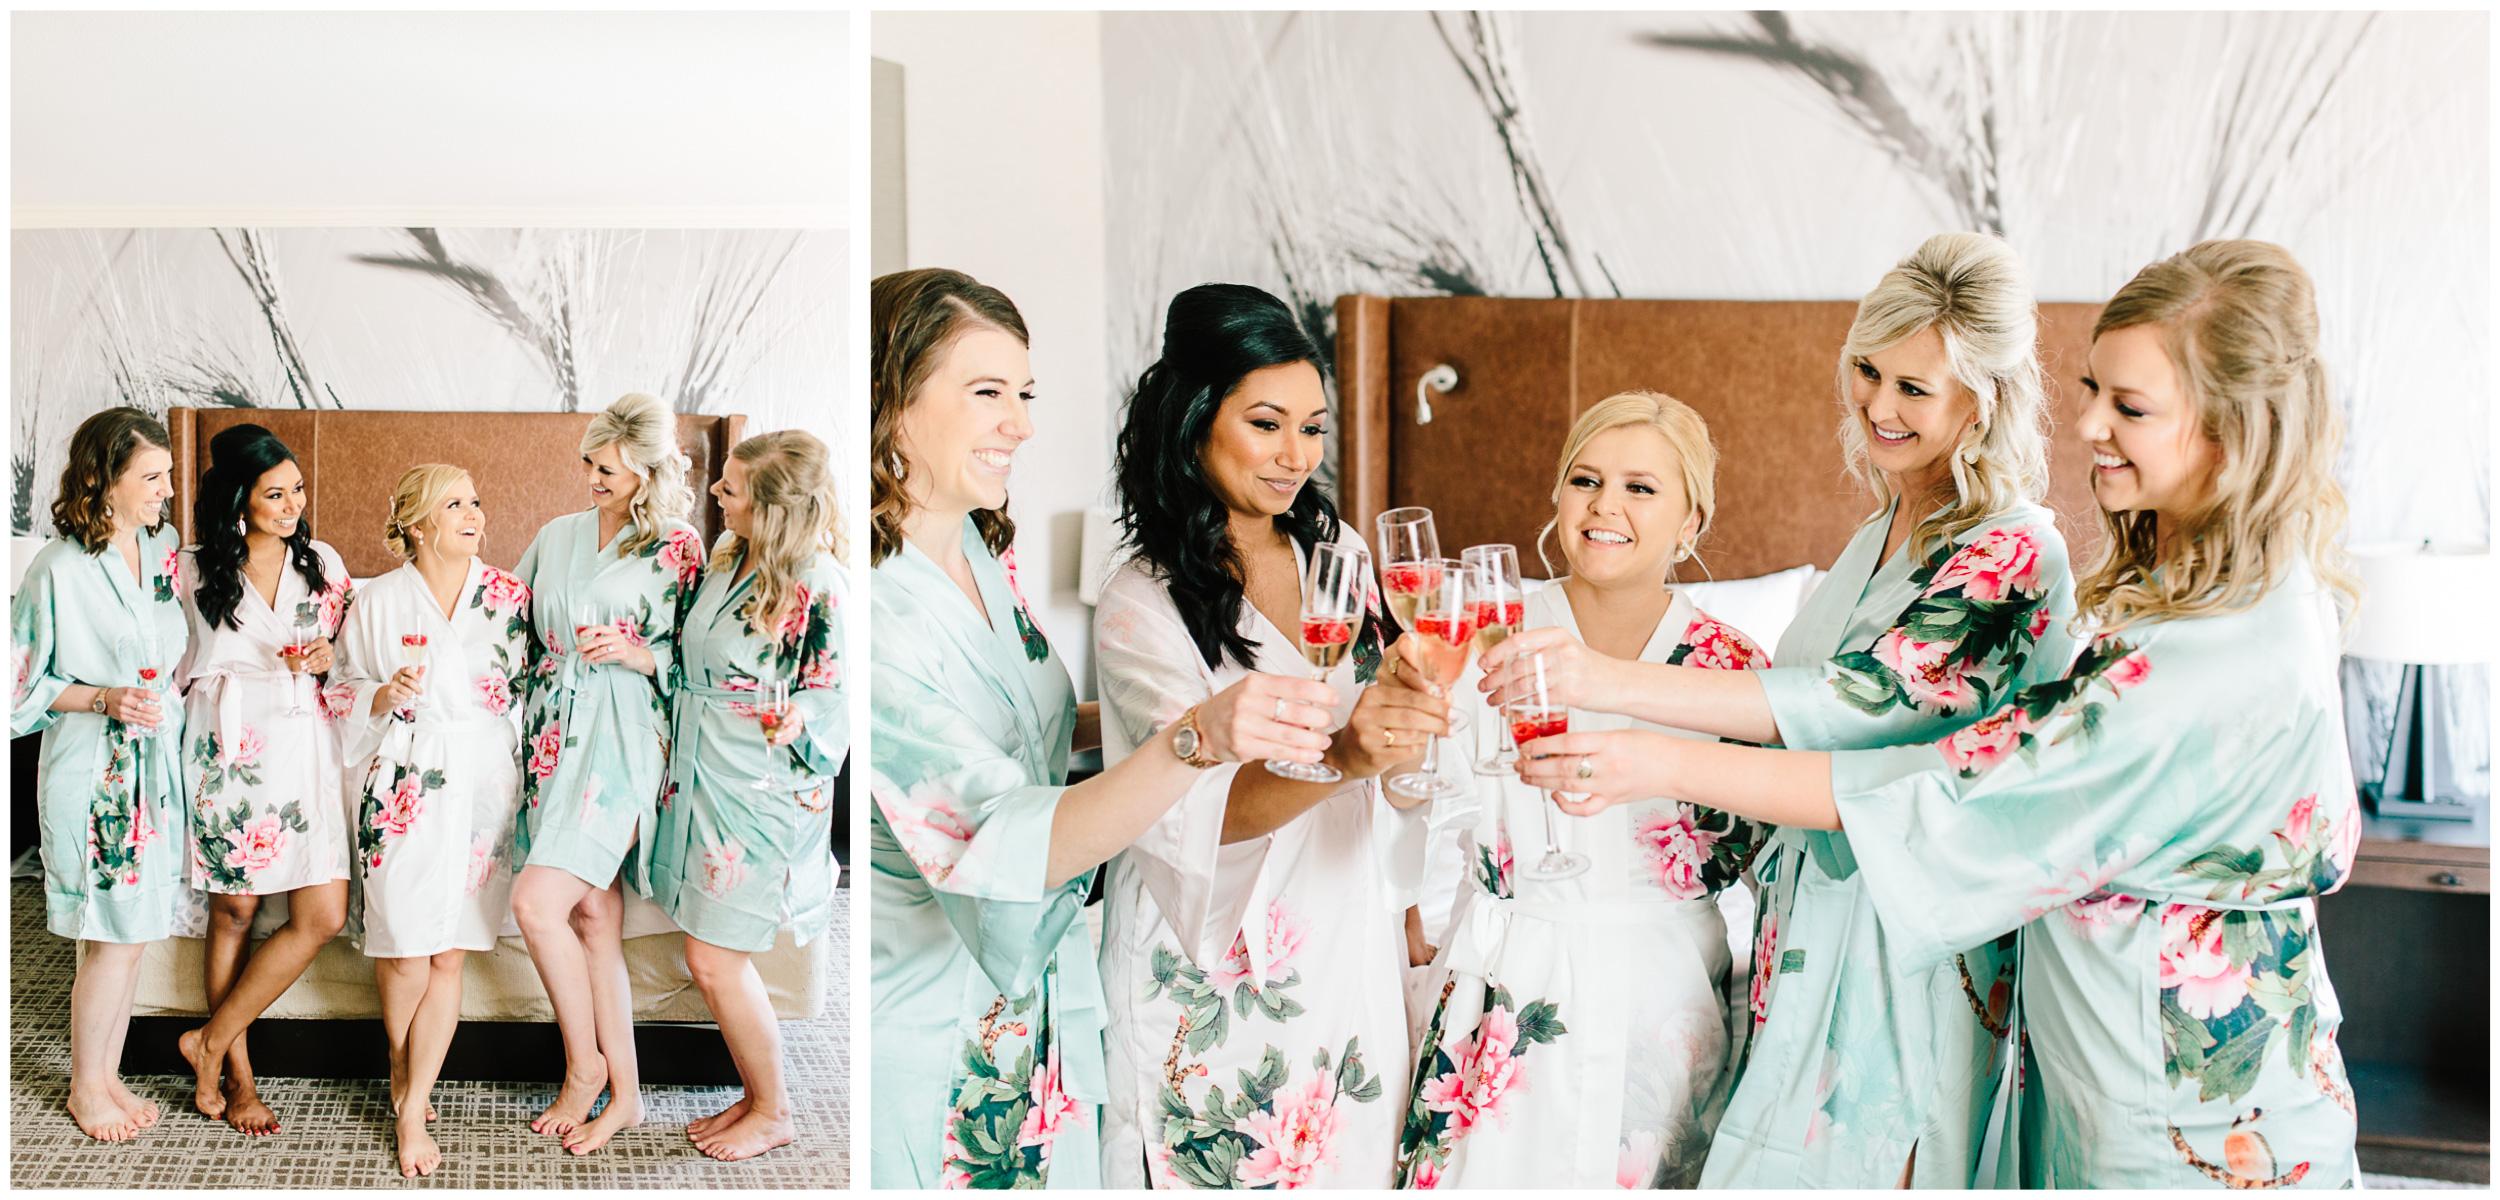 Lafayette_Colorado_Wedding_12.jpg